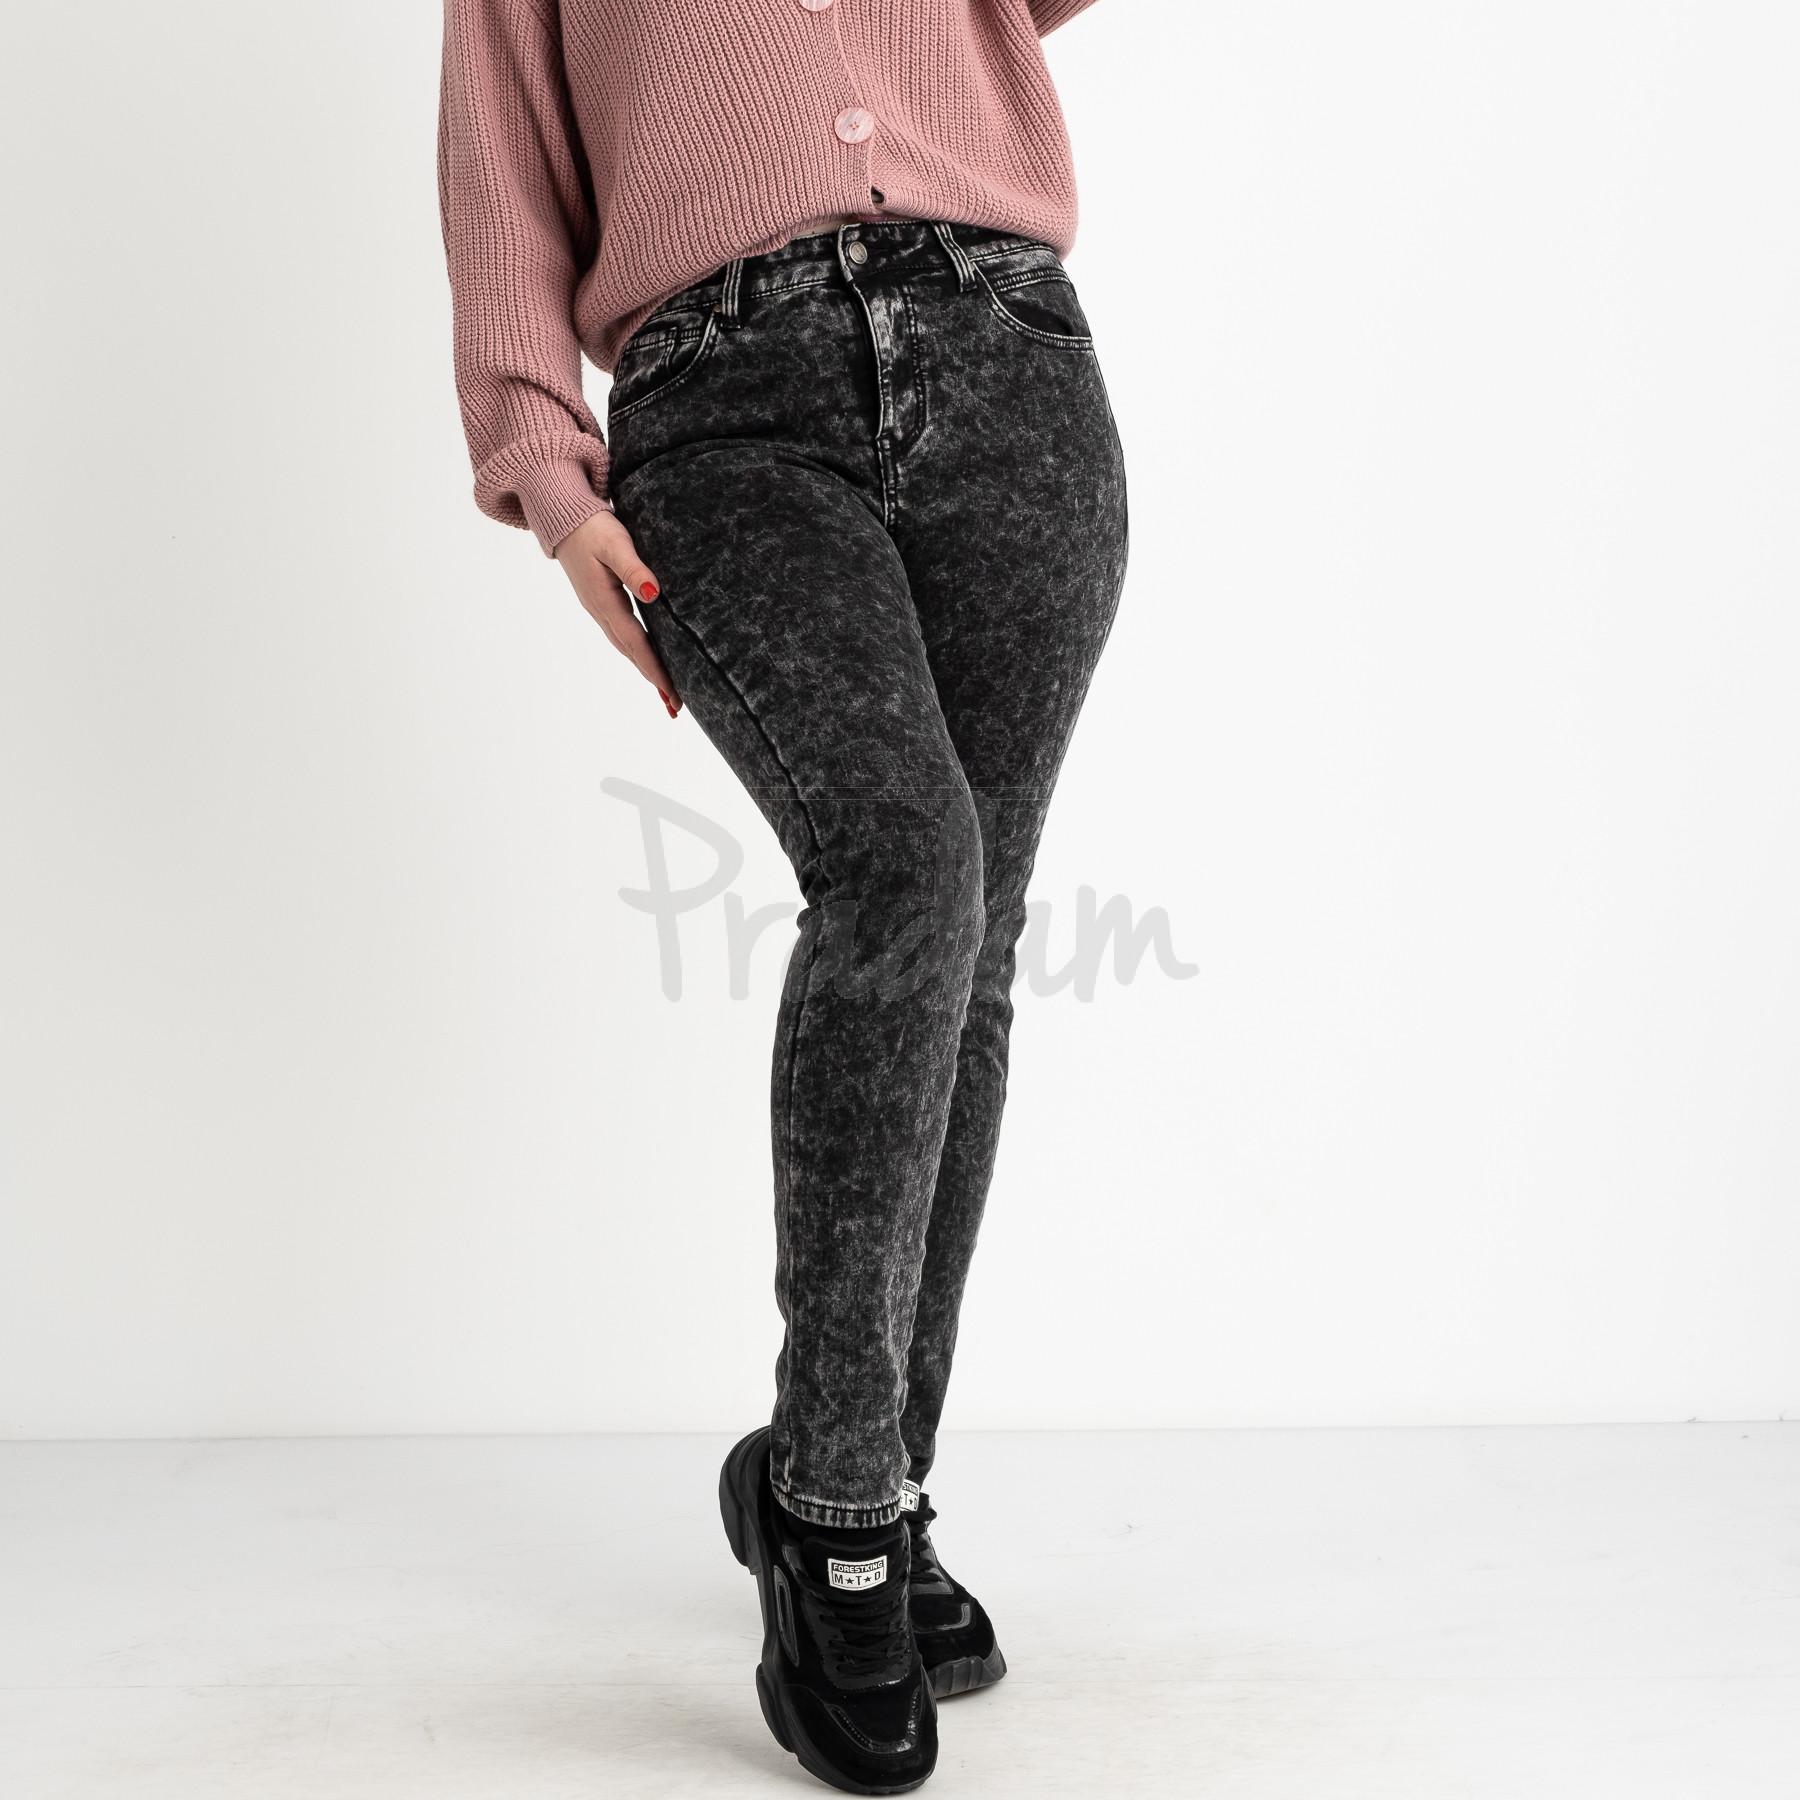 6025 New Jeans американка на флисе батальная серая стрейчевая (6 ед.размеры: 31.32.33.34.35.36)